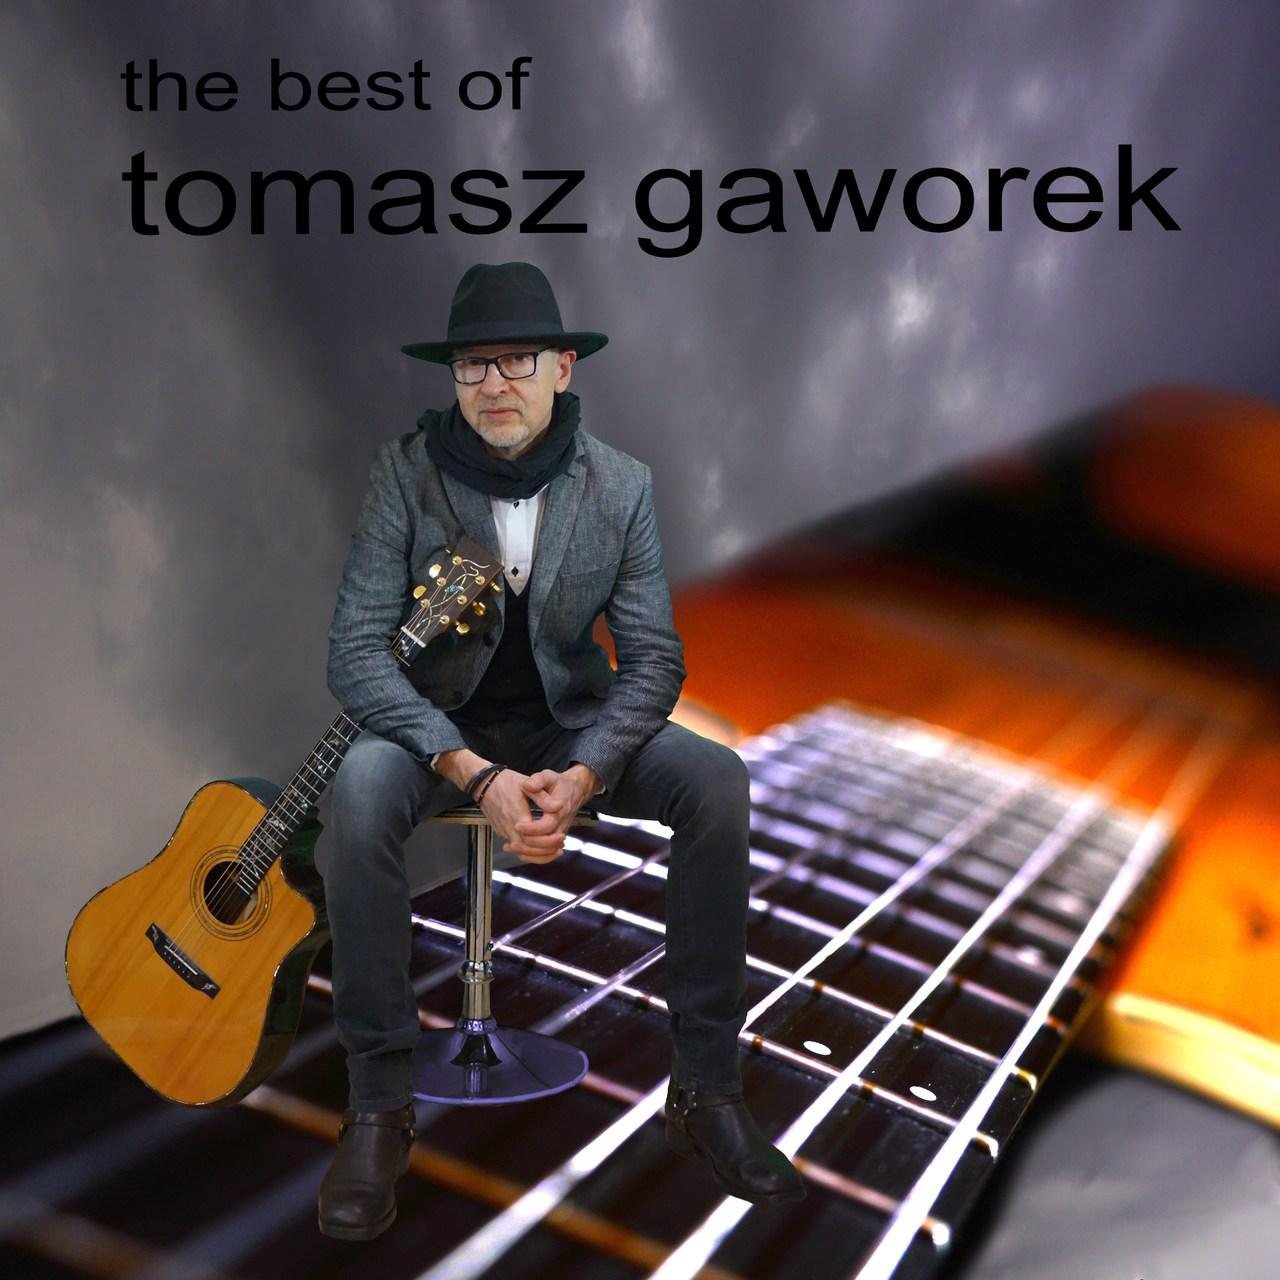 The Best of Tomasz Gaworek